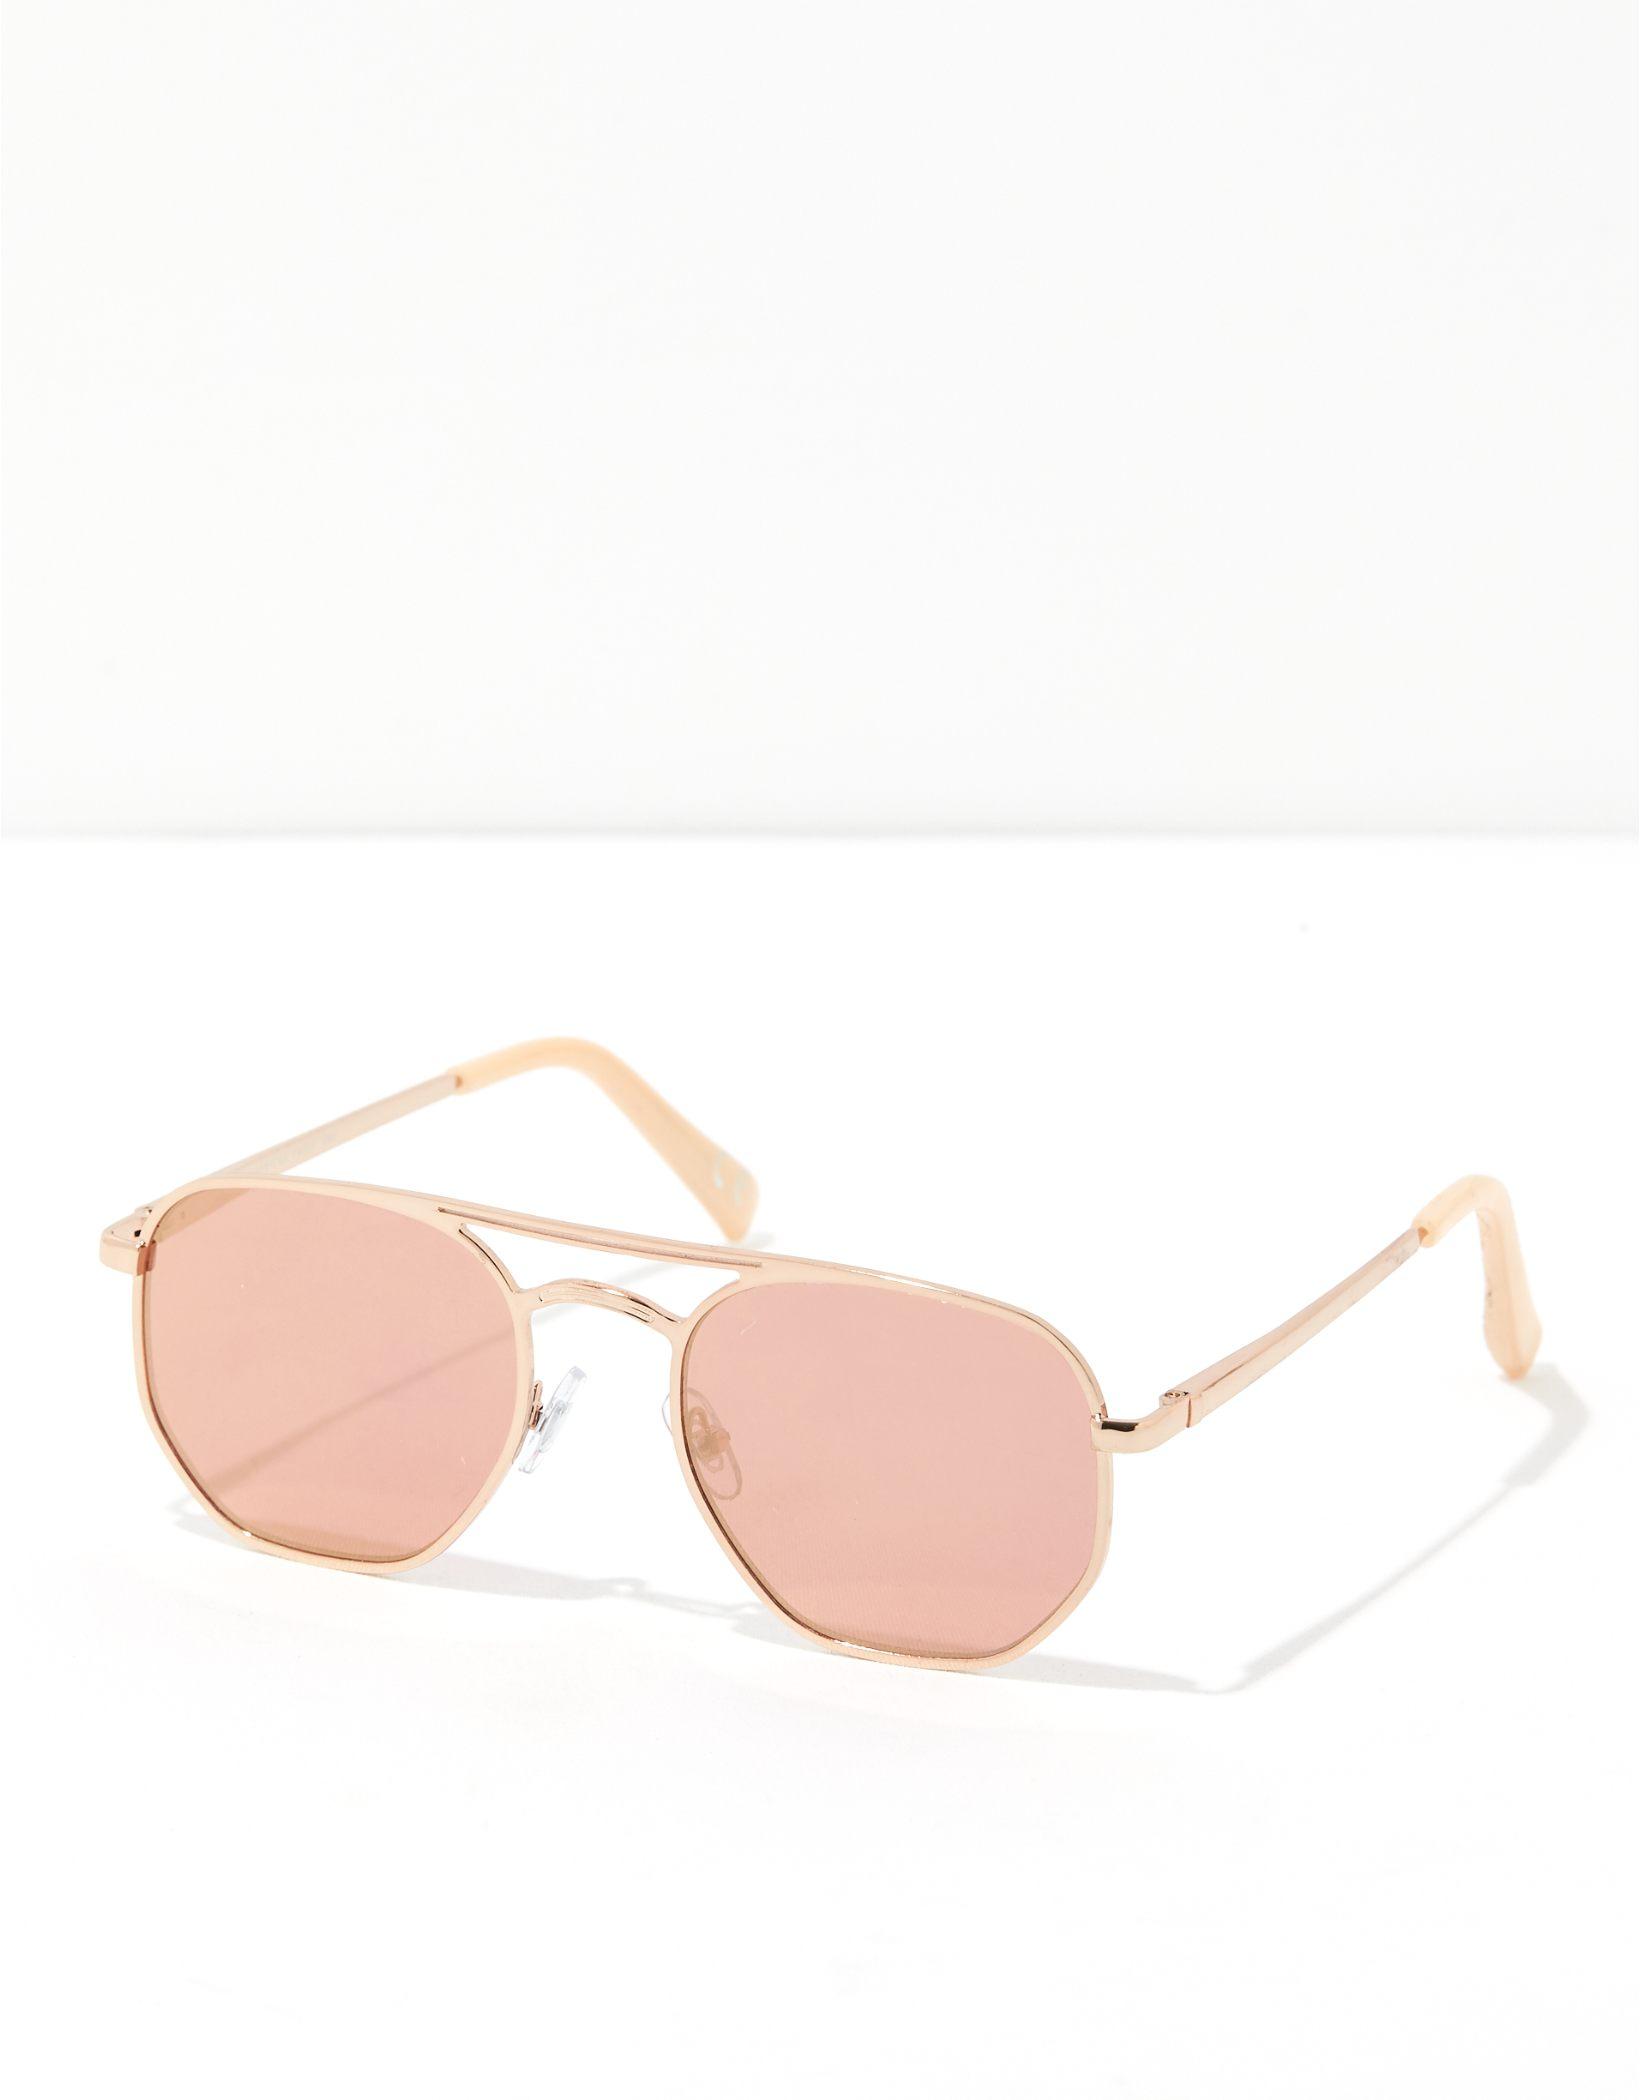 AEO Metal Aviator Sunglasses